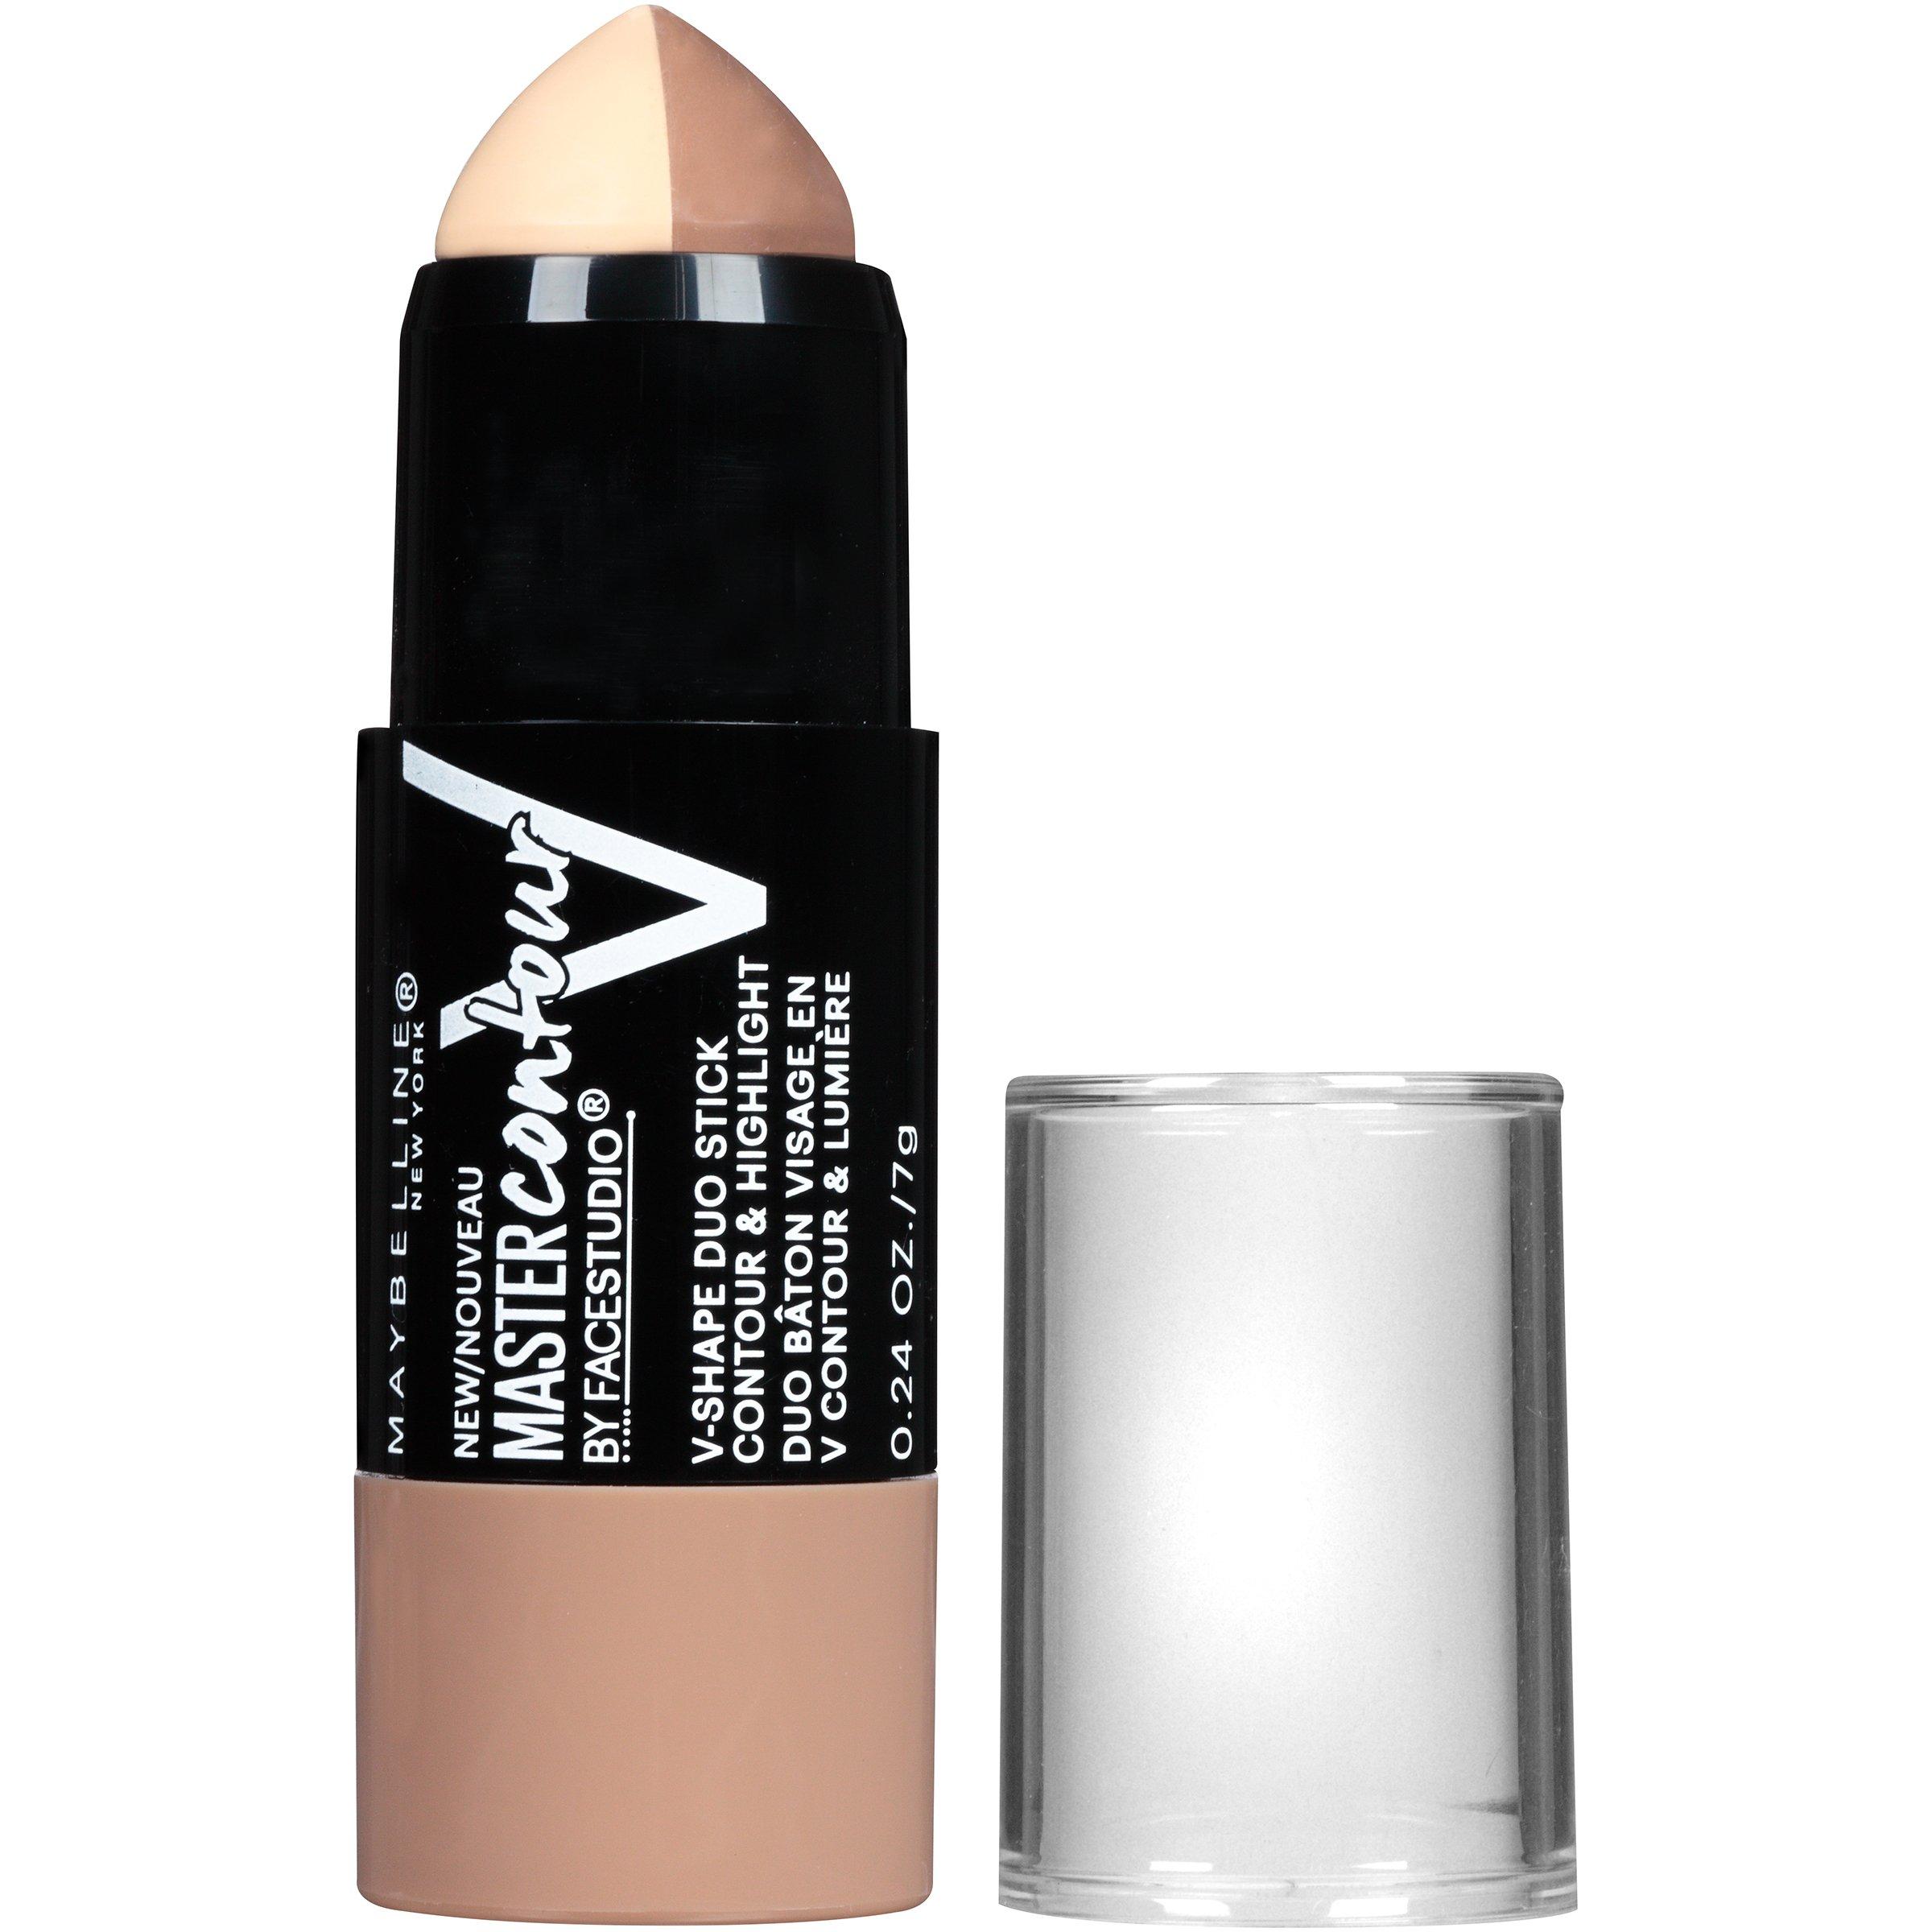 Maybelline Makeup Facestudio Master Strobing Stick Meyne V Face Contour Shape Duo Light Shade